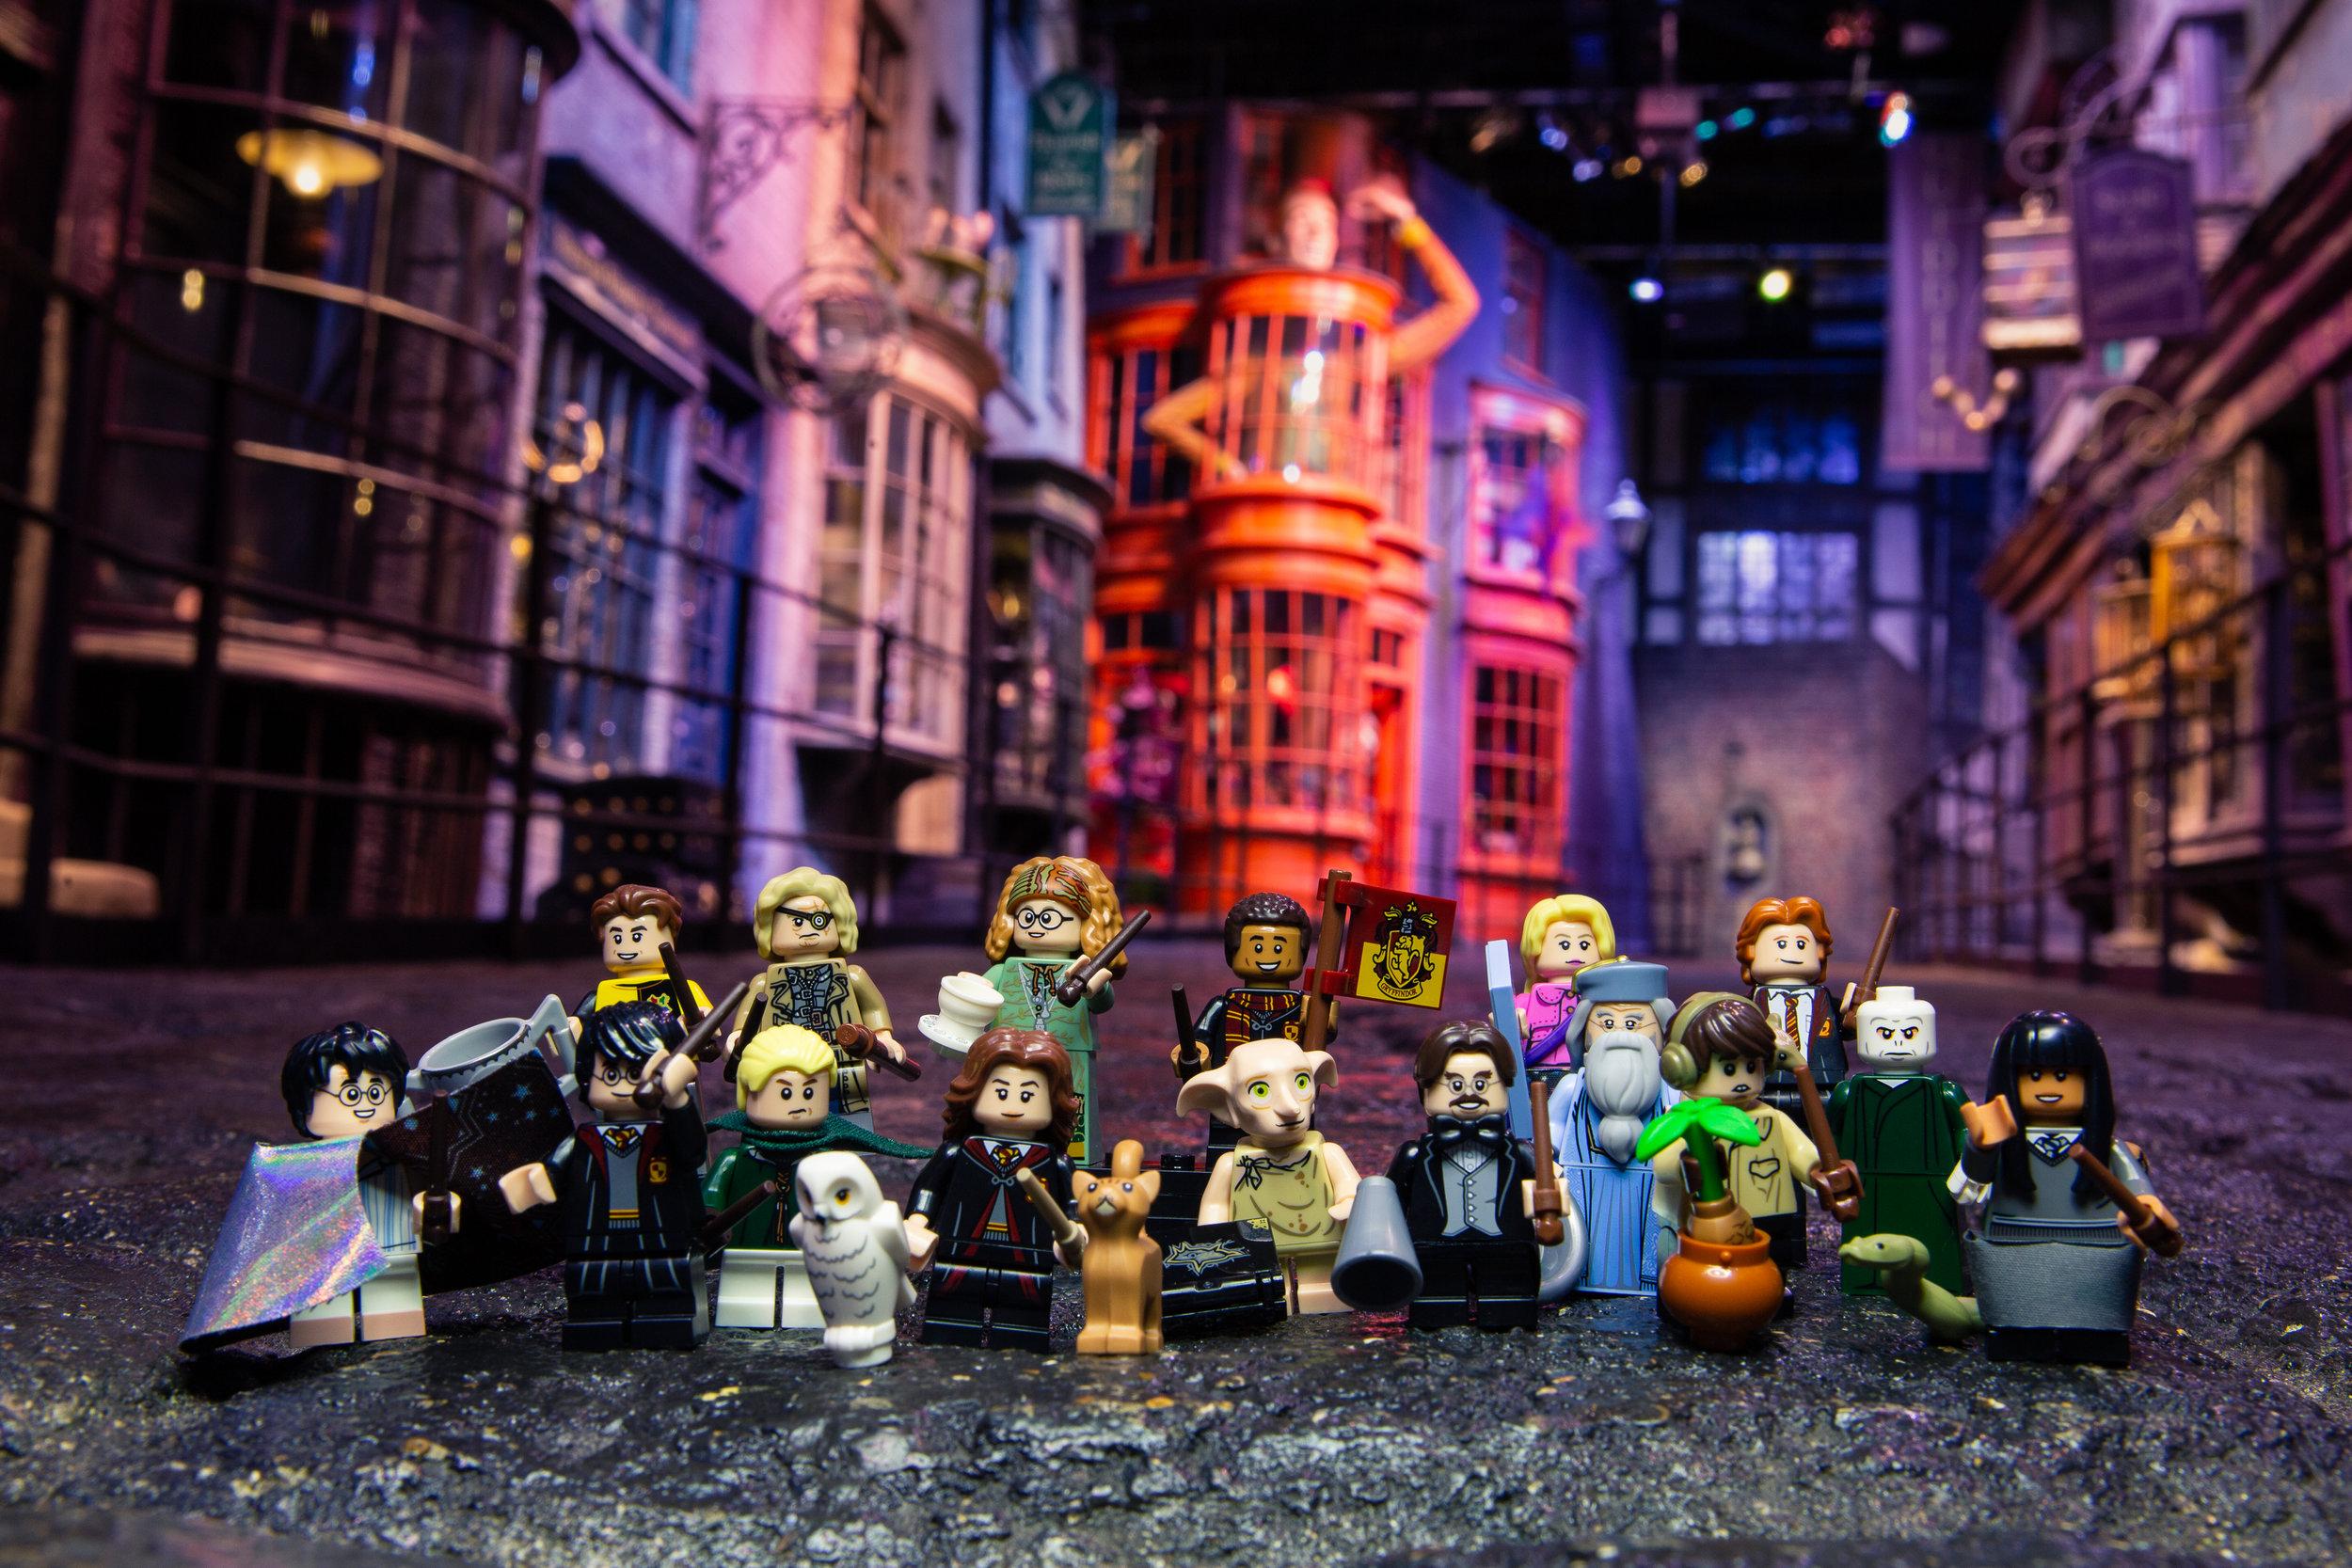 LEGO_WBST_19.06.18_hi-res-51.jpg